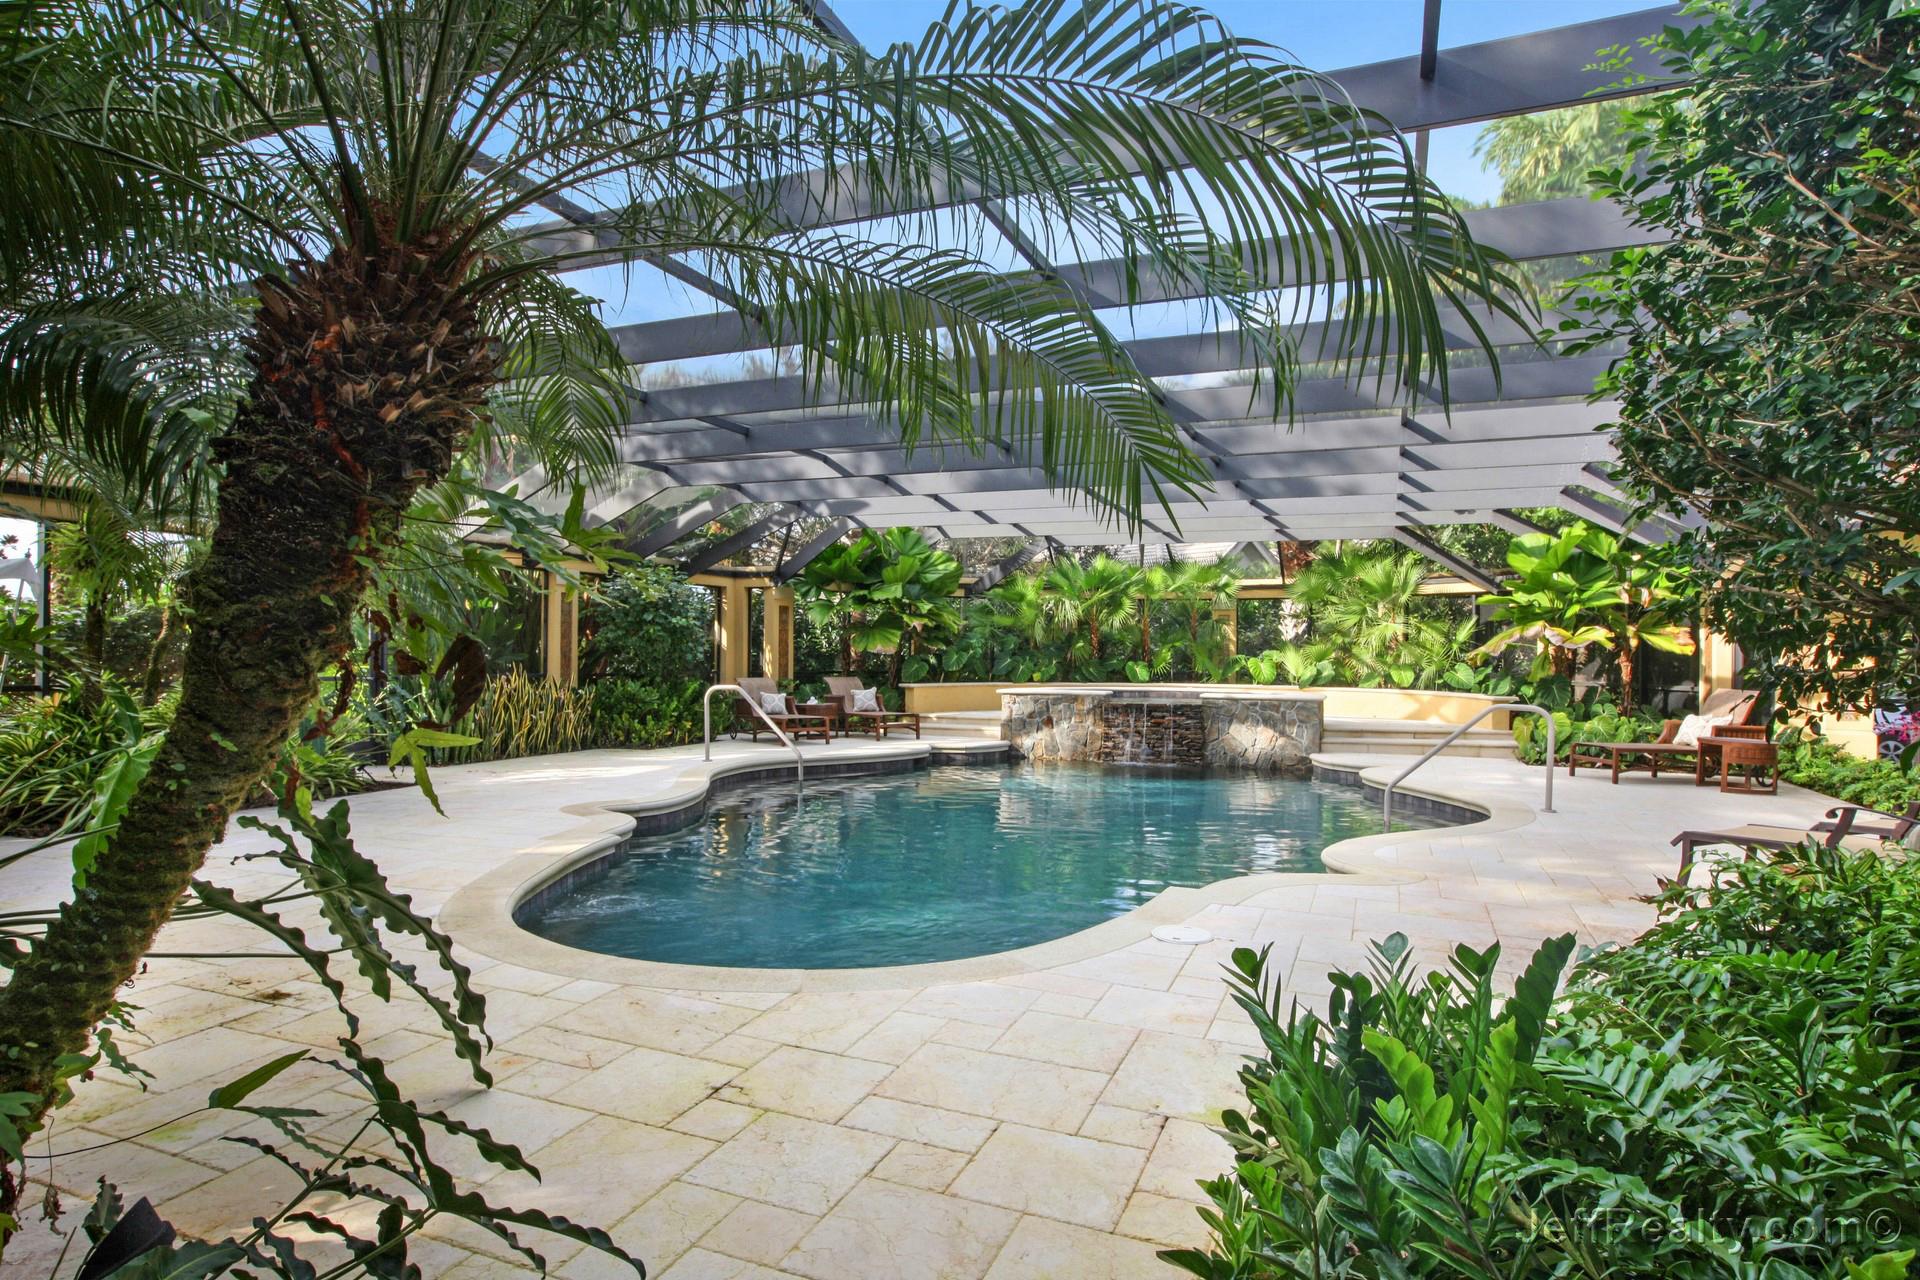 12981 Brynwood - Swimming Pool